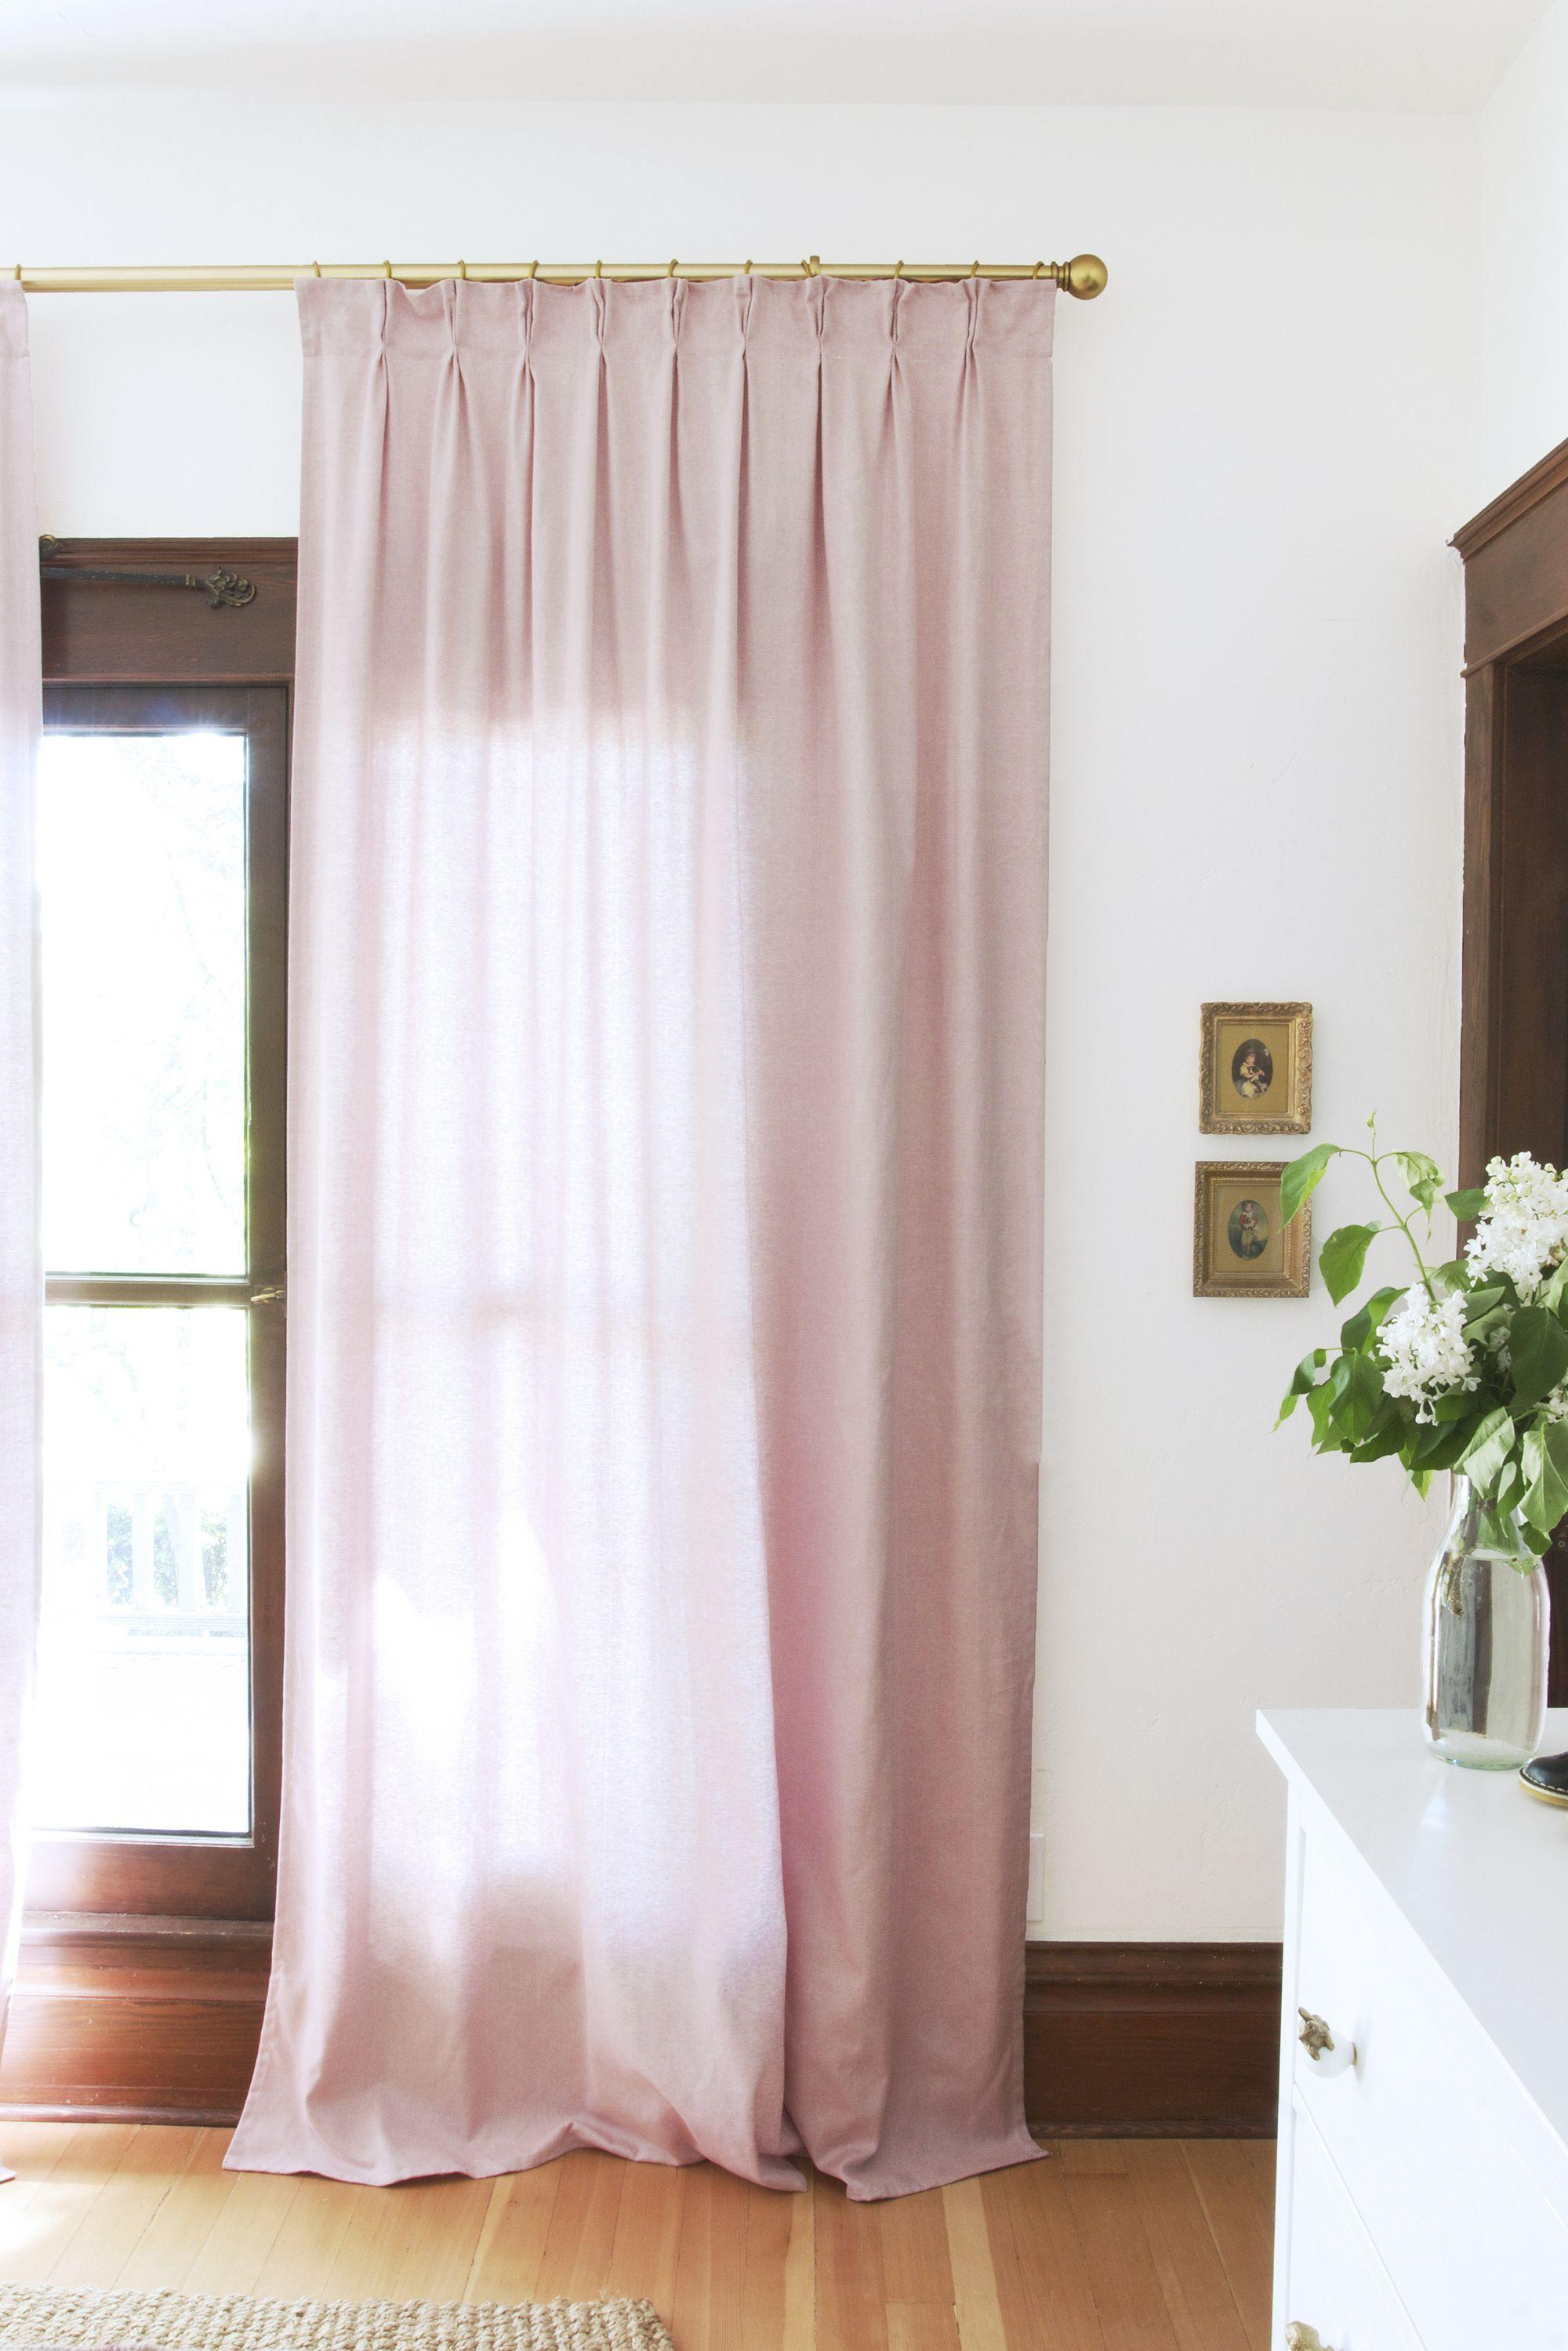 Diy Pinch Pleat Curtains How To Make Budget Ikea Curtains Look Like A Million Bucks Ikea Curtains Pinch Pleat Curtains Curtains